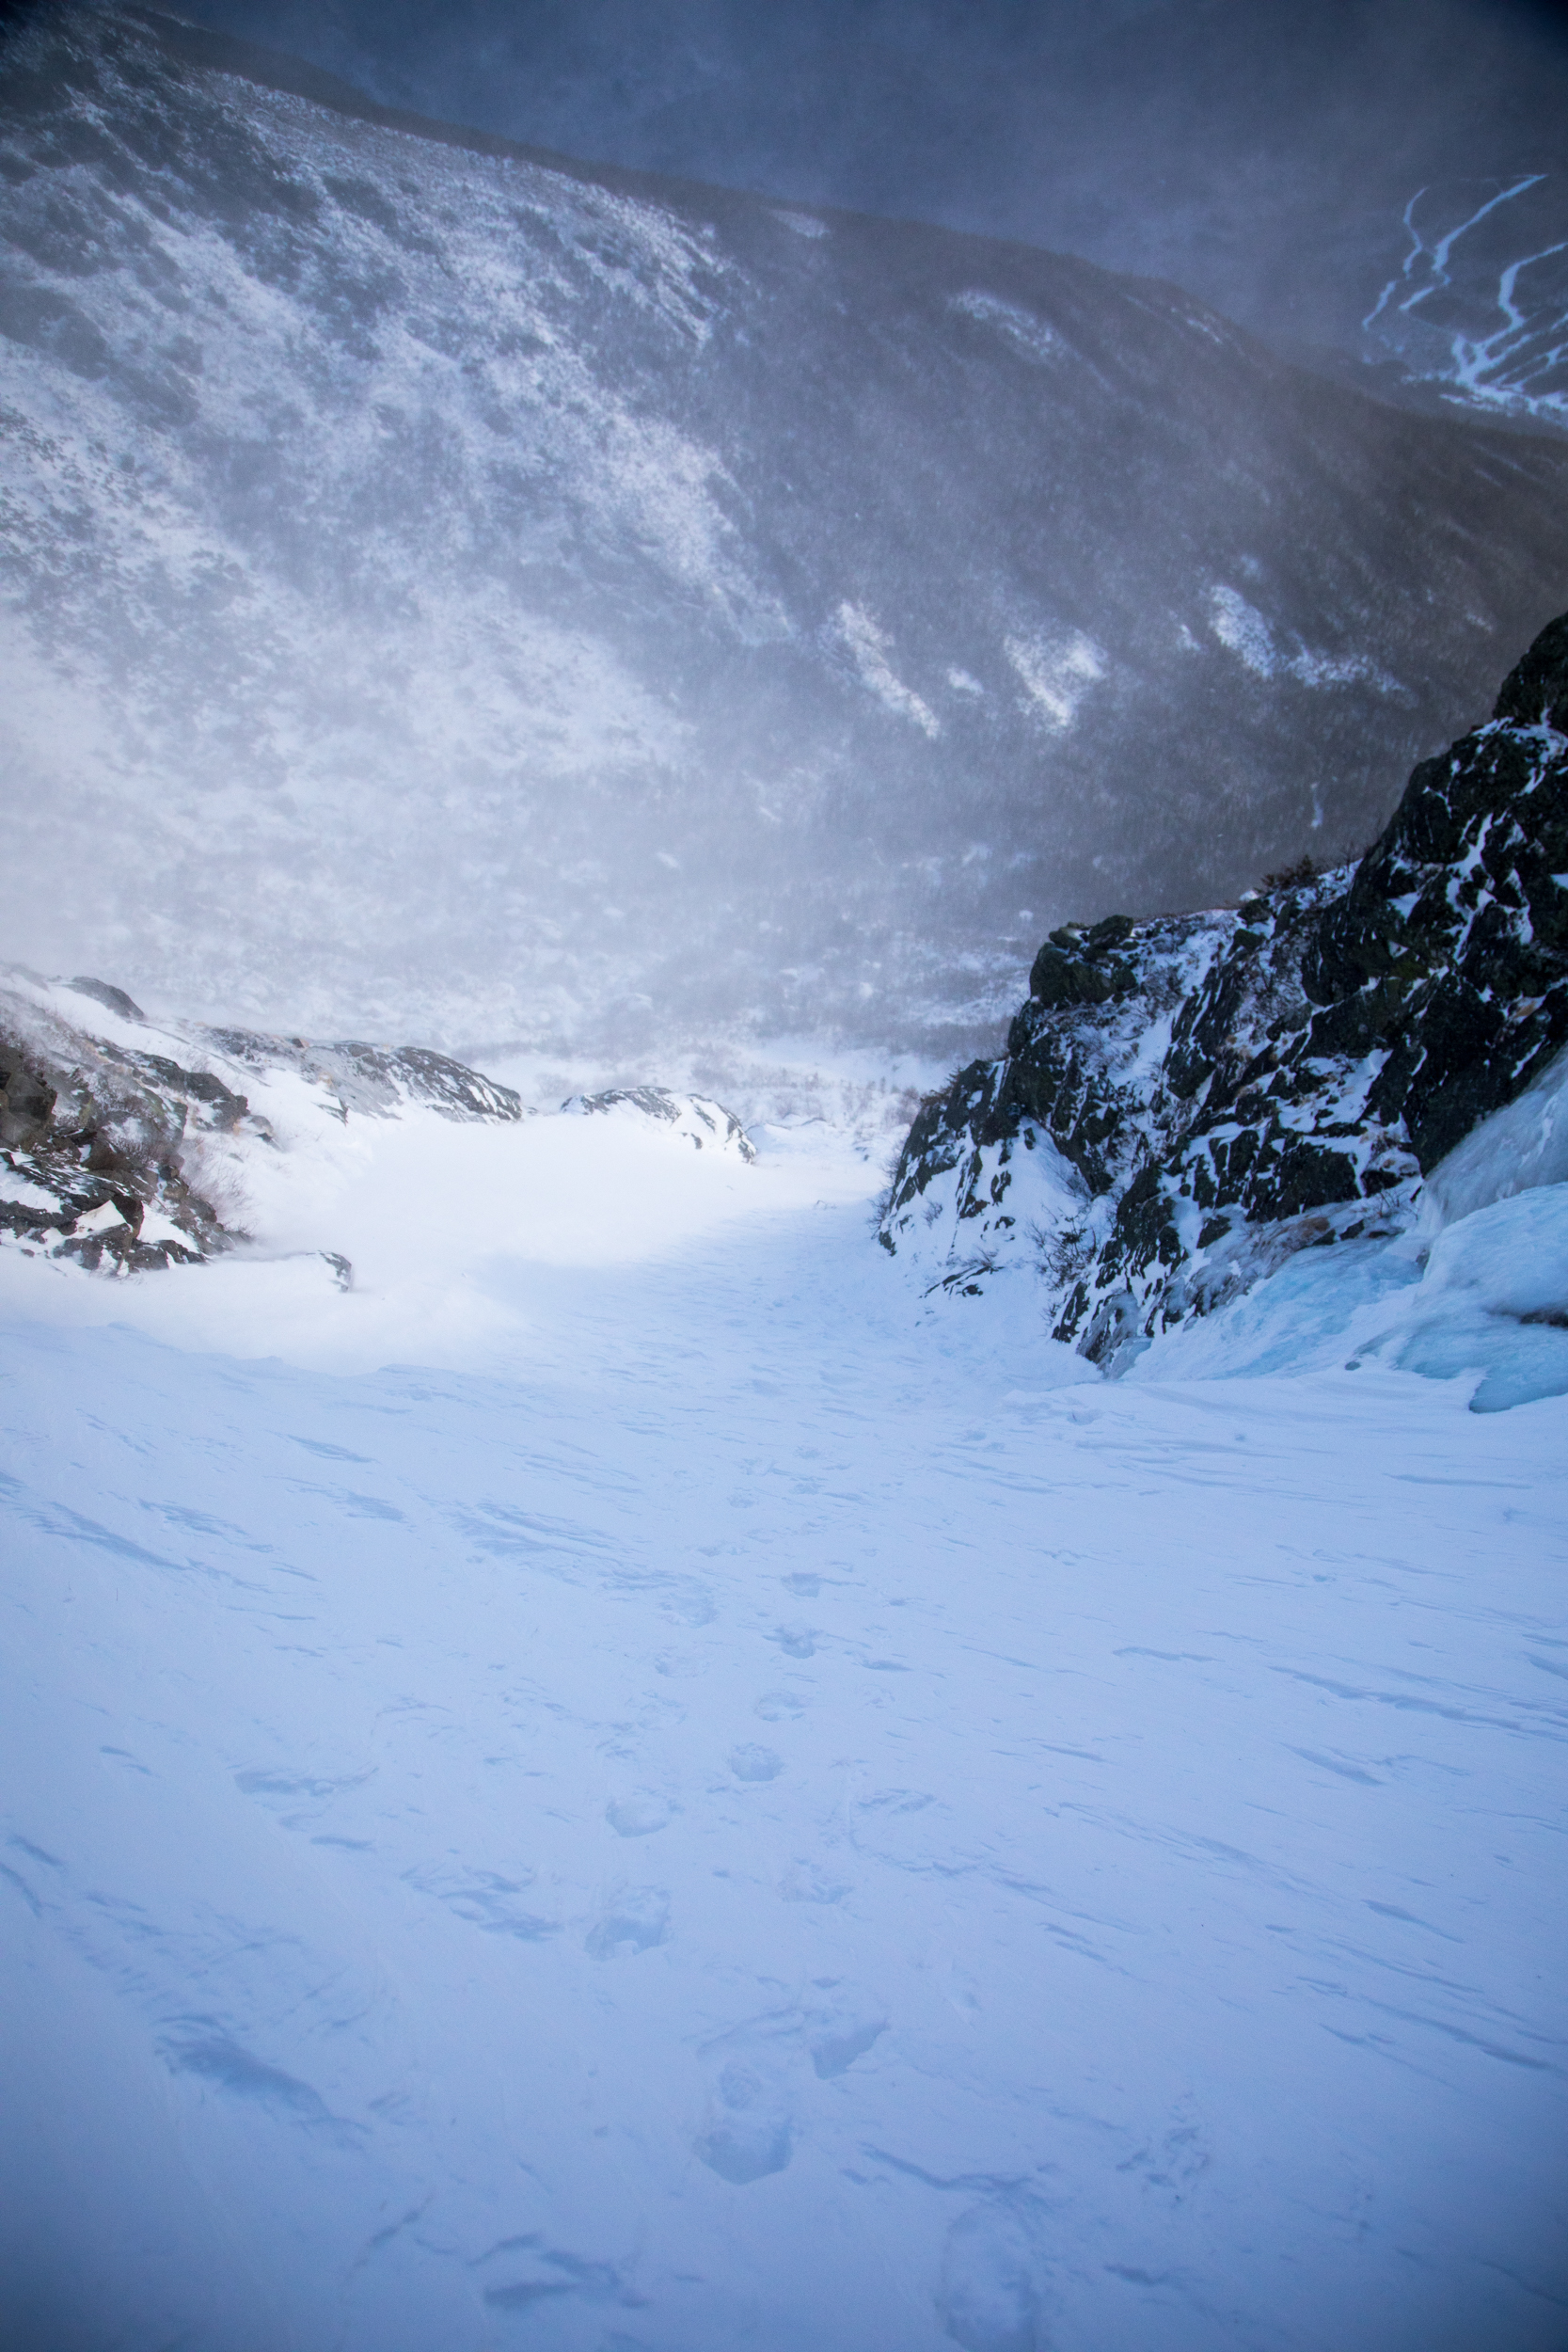 O'dells Gully Huntington Ravine Skiing.jpg